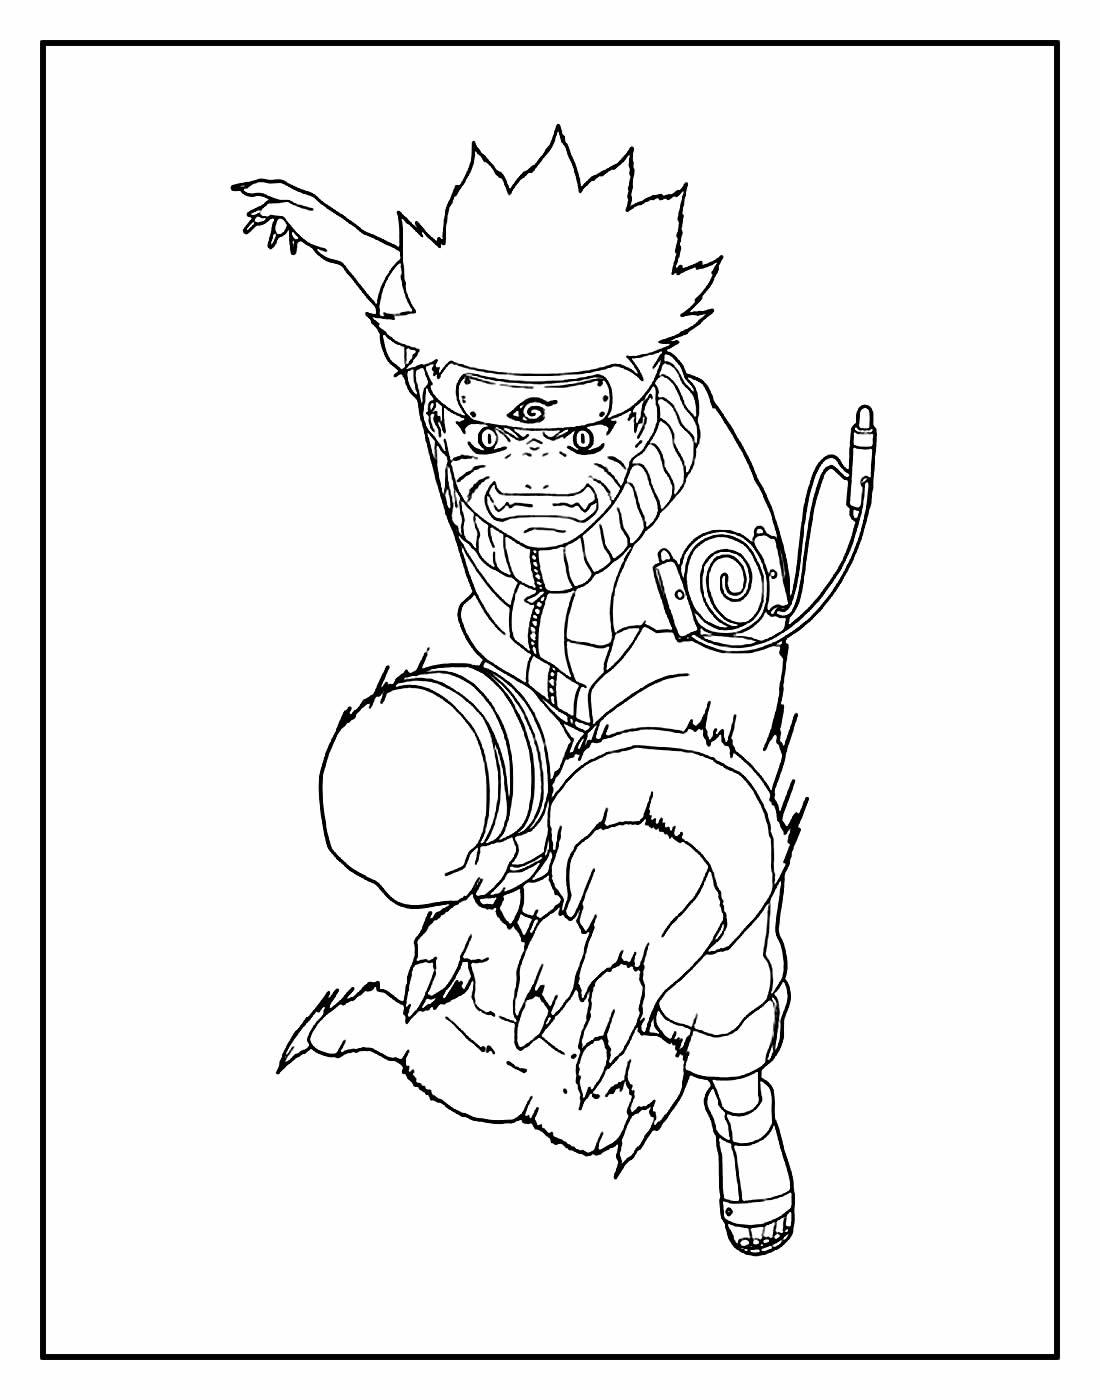 Desenho para colorir de Naruto